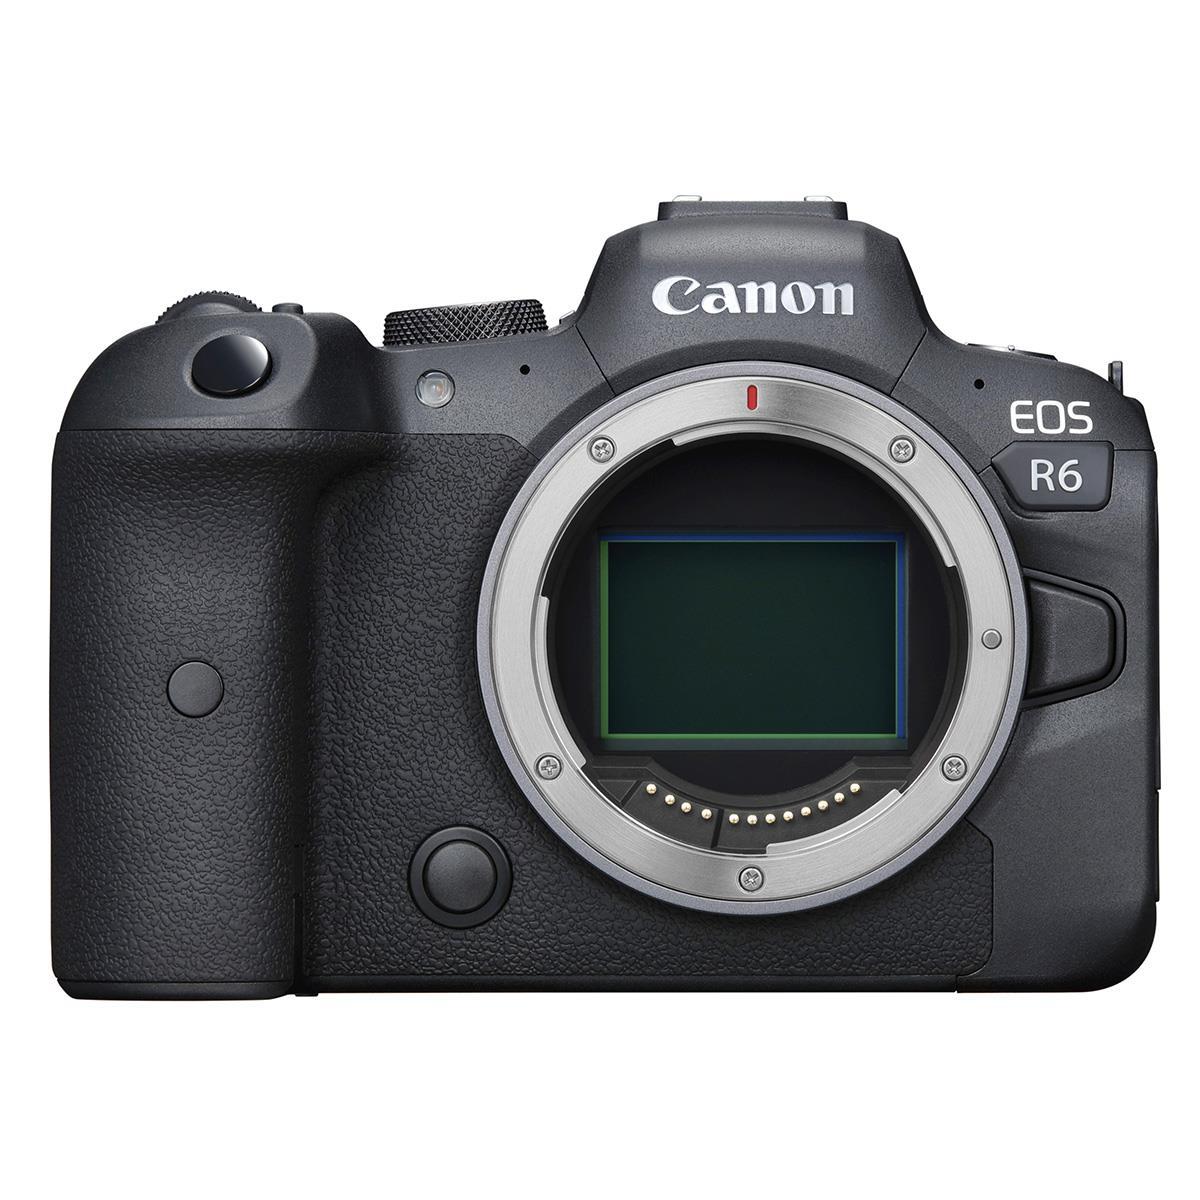 2020 Canon Eos R6 Black Friday Cyber Monday Deals Sales Camera News At Cameraegg